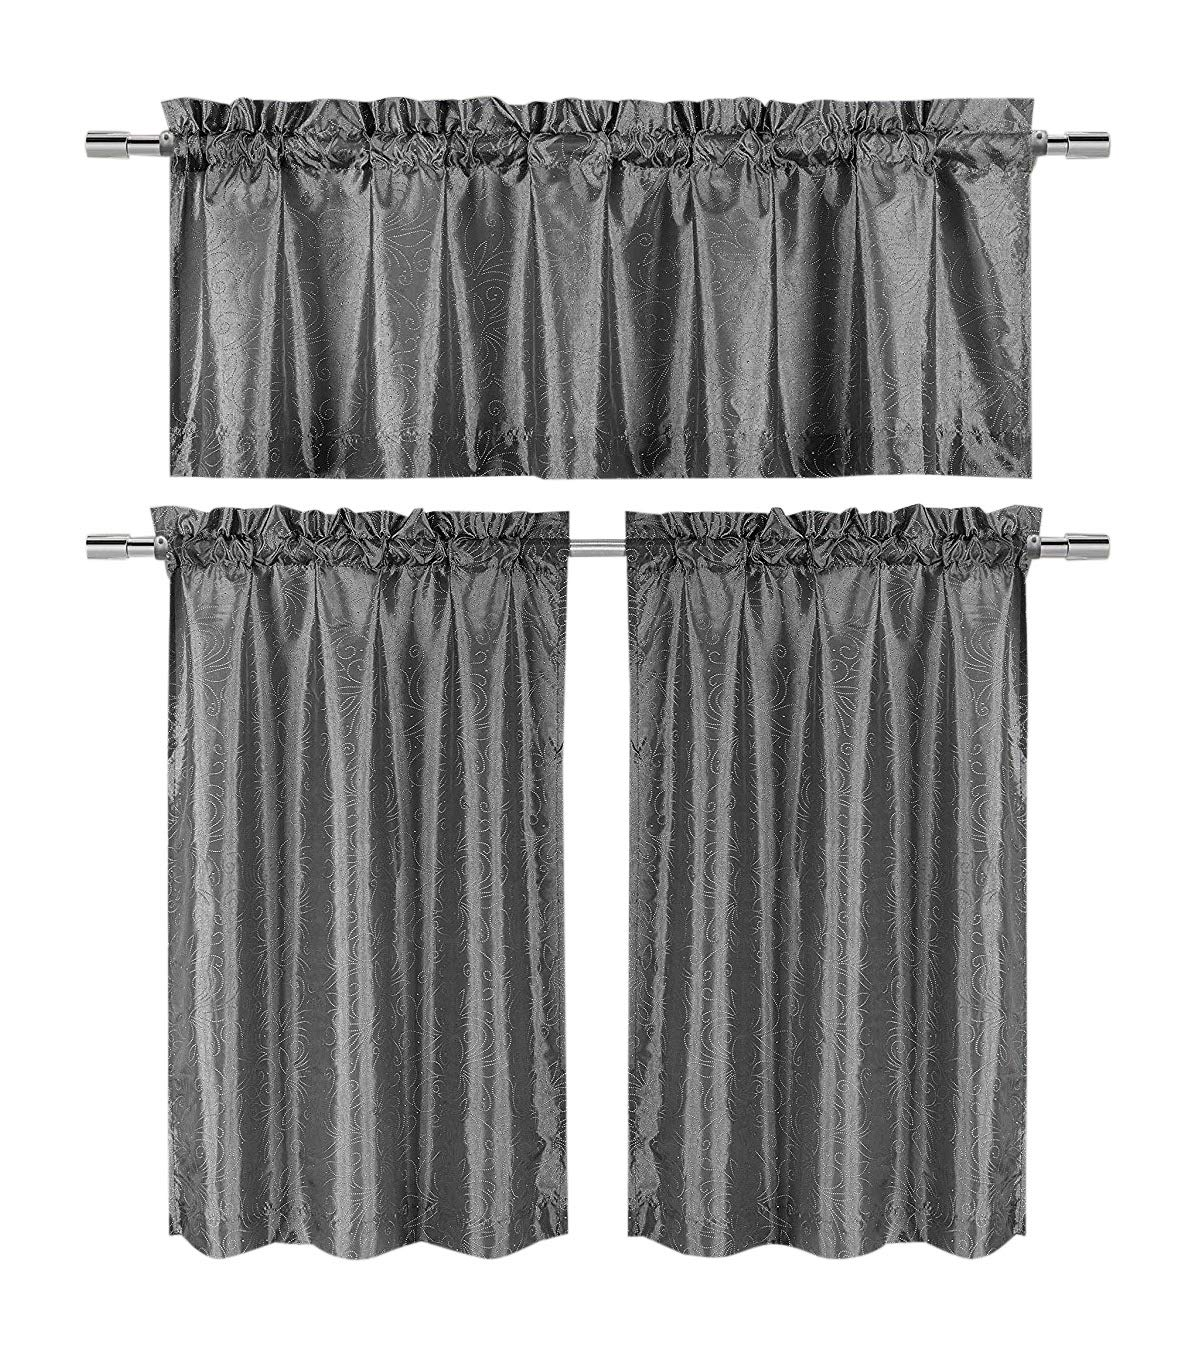 3 Pc Kitchen Window Curtain Set: Faux Silk, Raised Pin Dots, Floral Design (Gray)